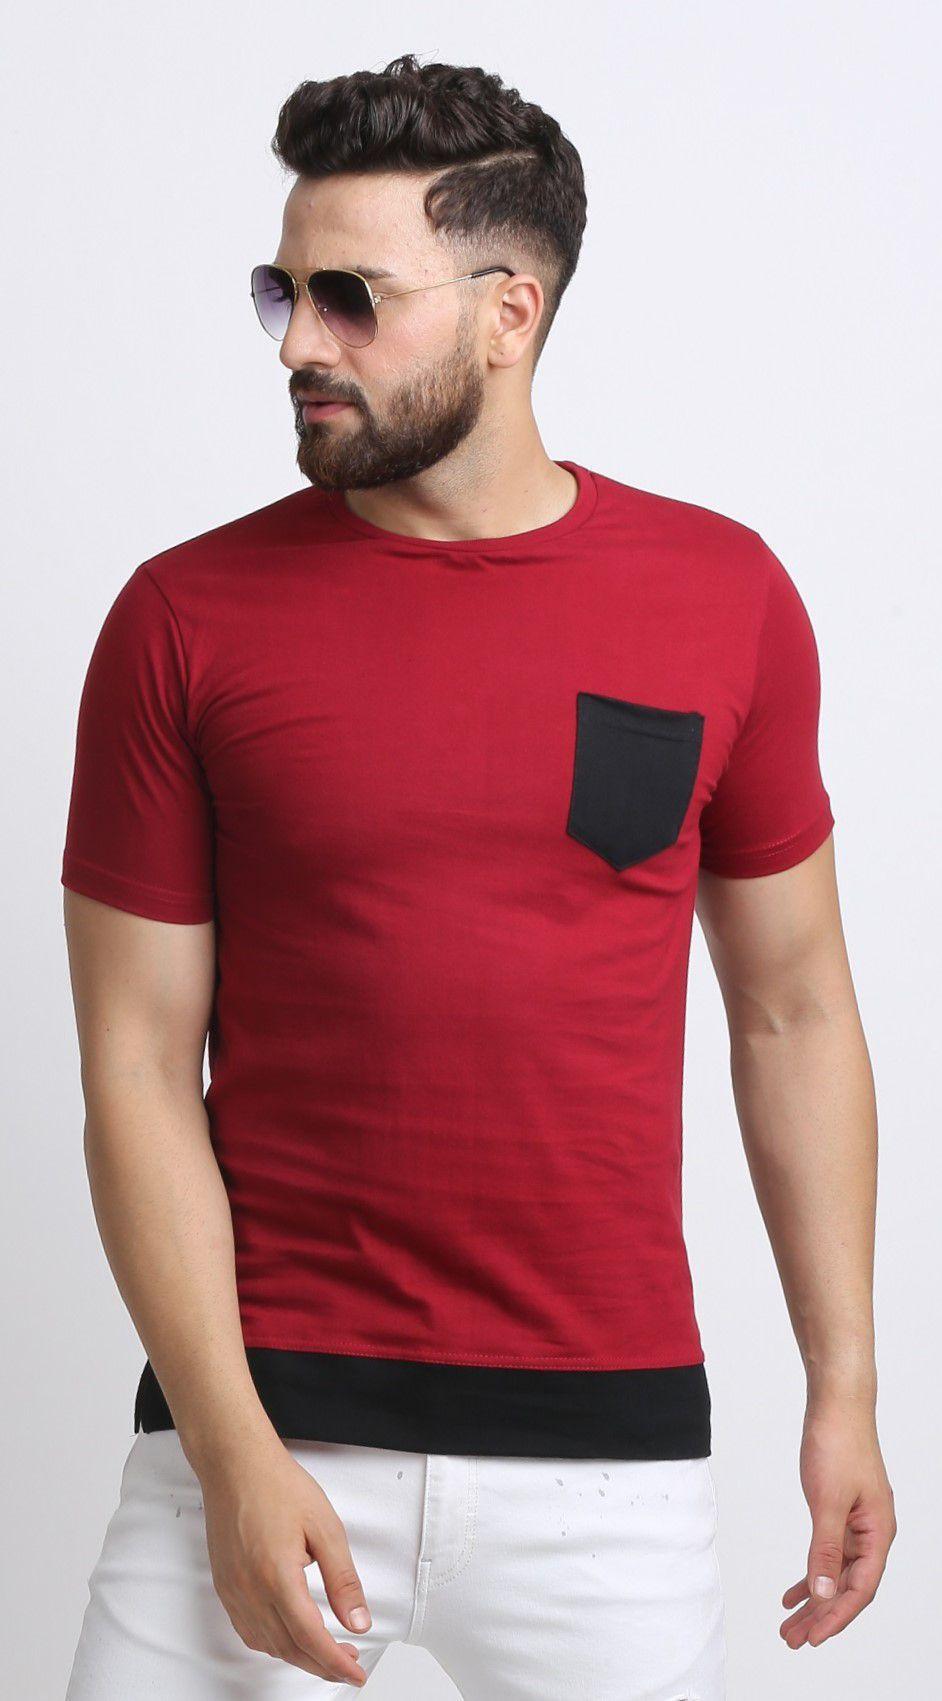 Leotude 100 Percent Cotton Maroon Solids T-Shirt